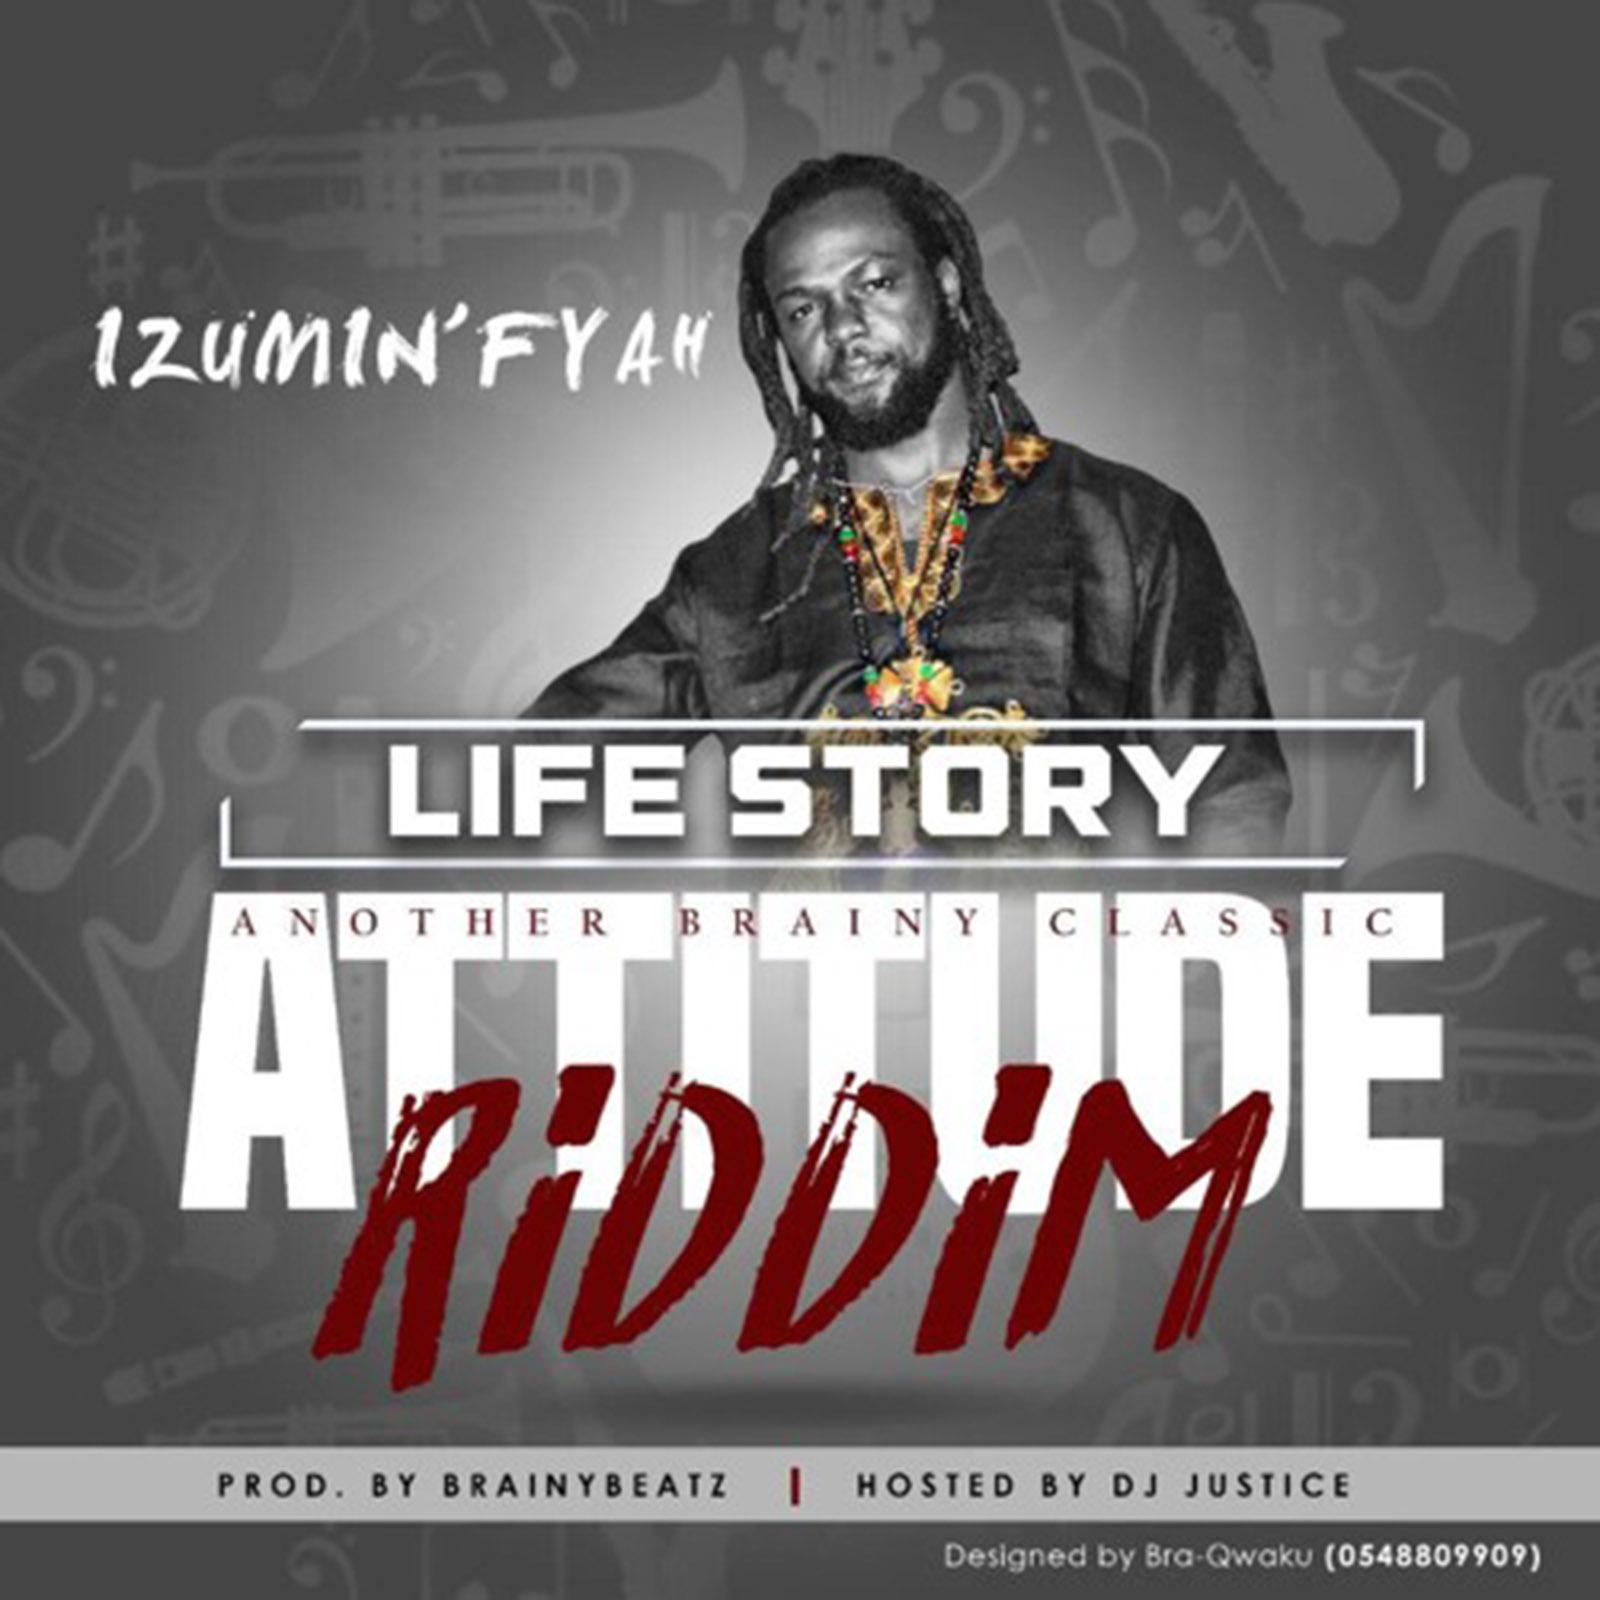 Life Story (Attitude Riddim) by Izumin Fyah